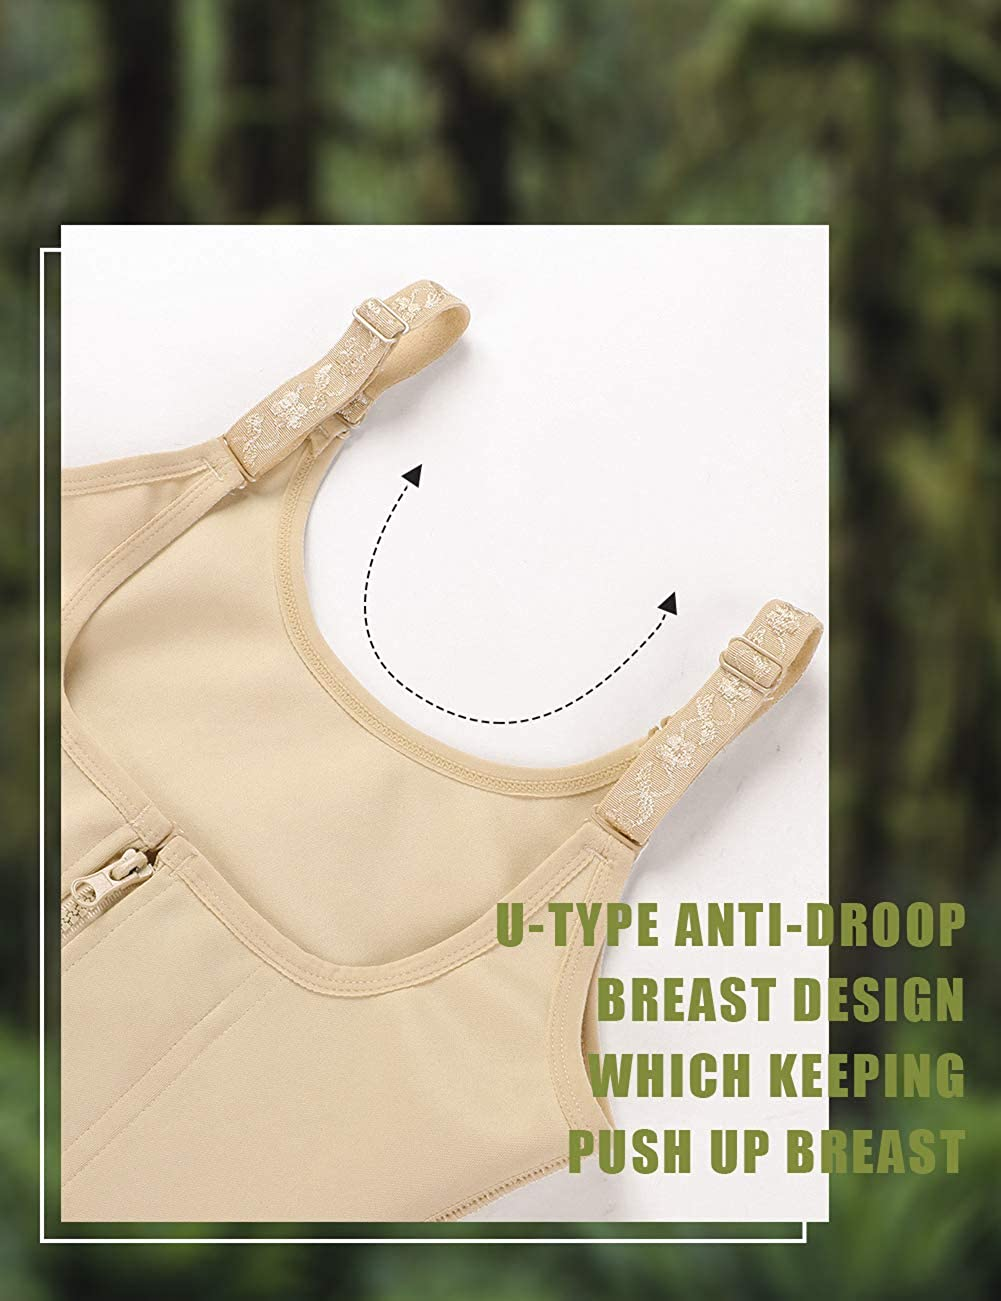 FeelinGirl Women/'s Zipper Waist Trainer Corset for Weight Loss Tummy Control Body Shaper Vest Skin XL